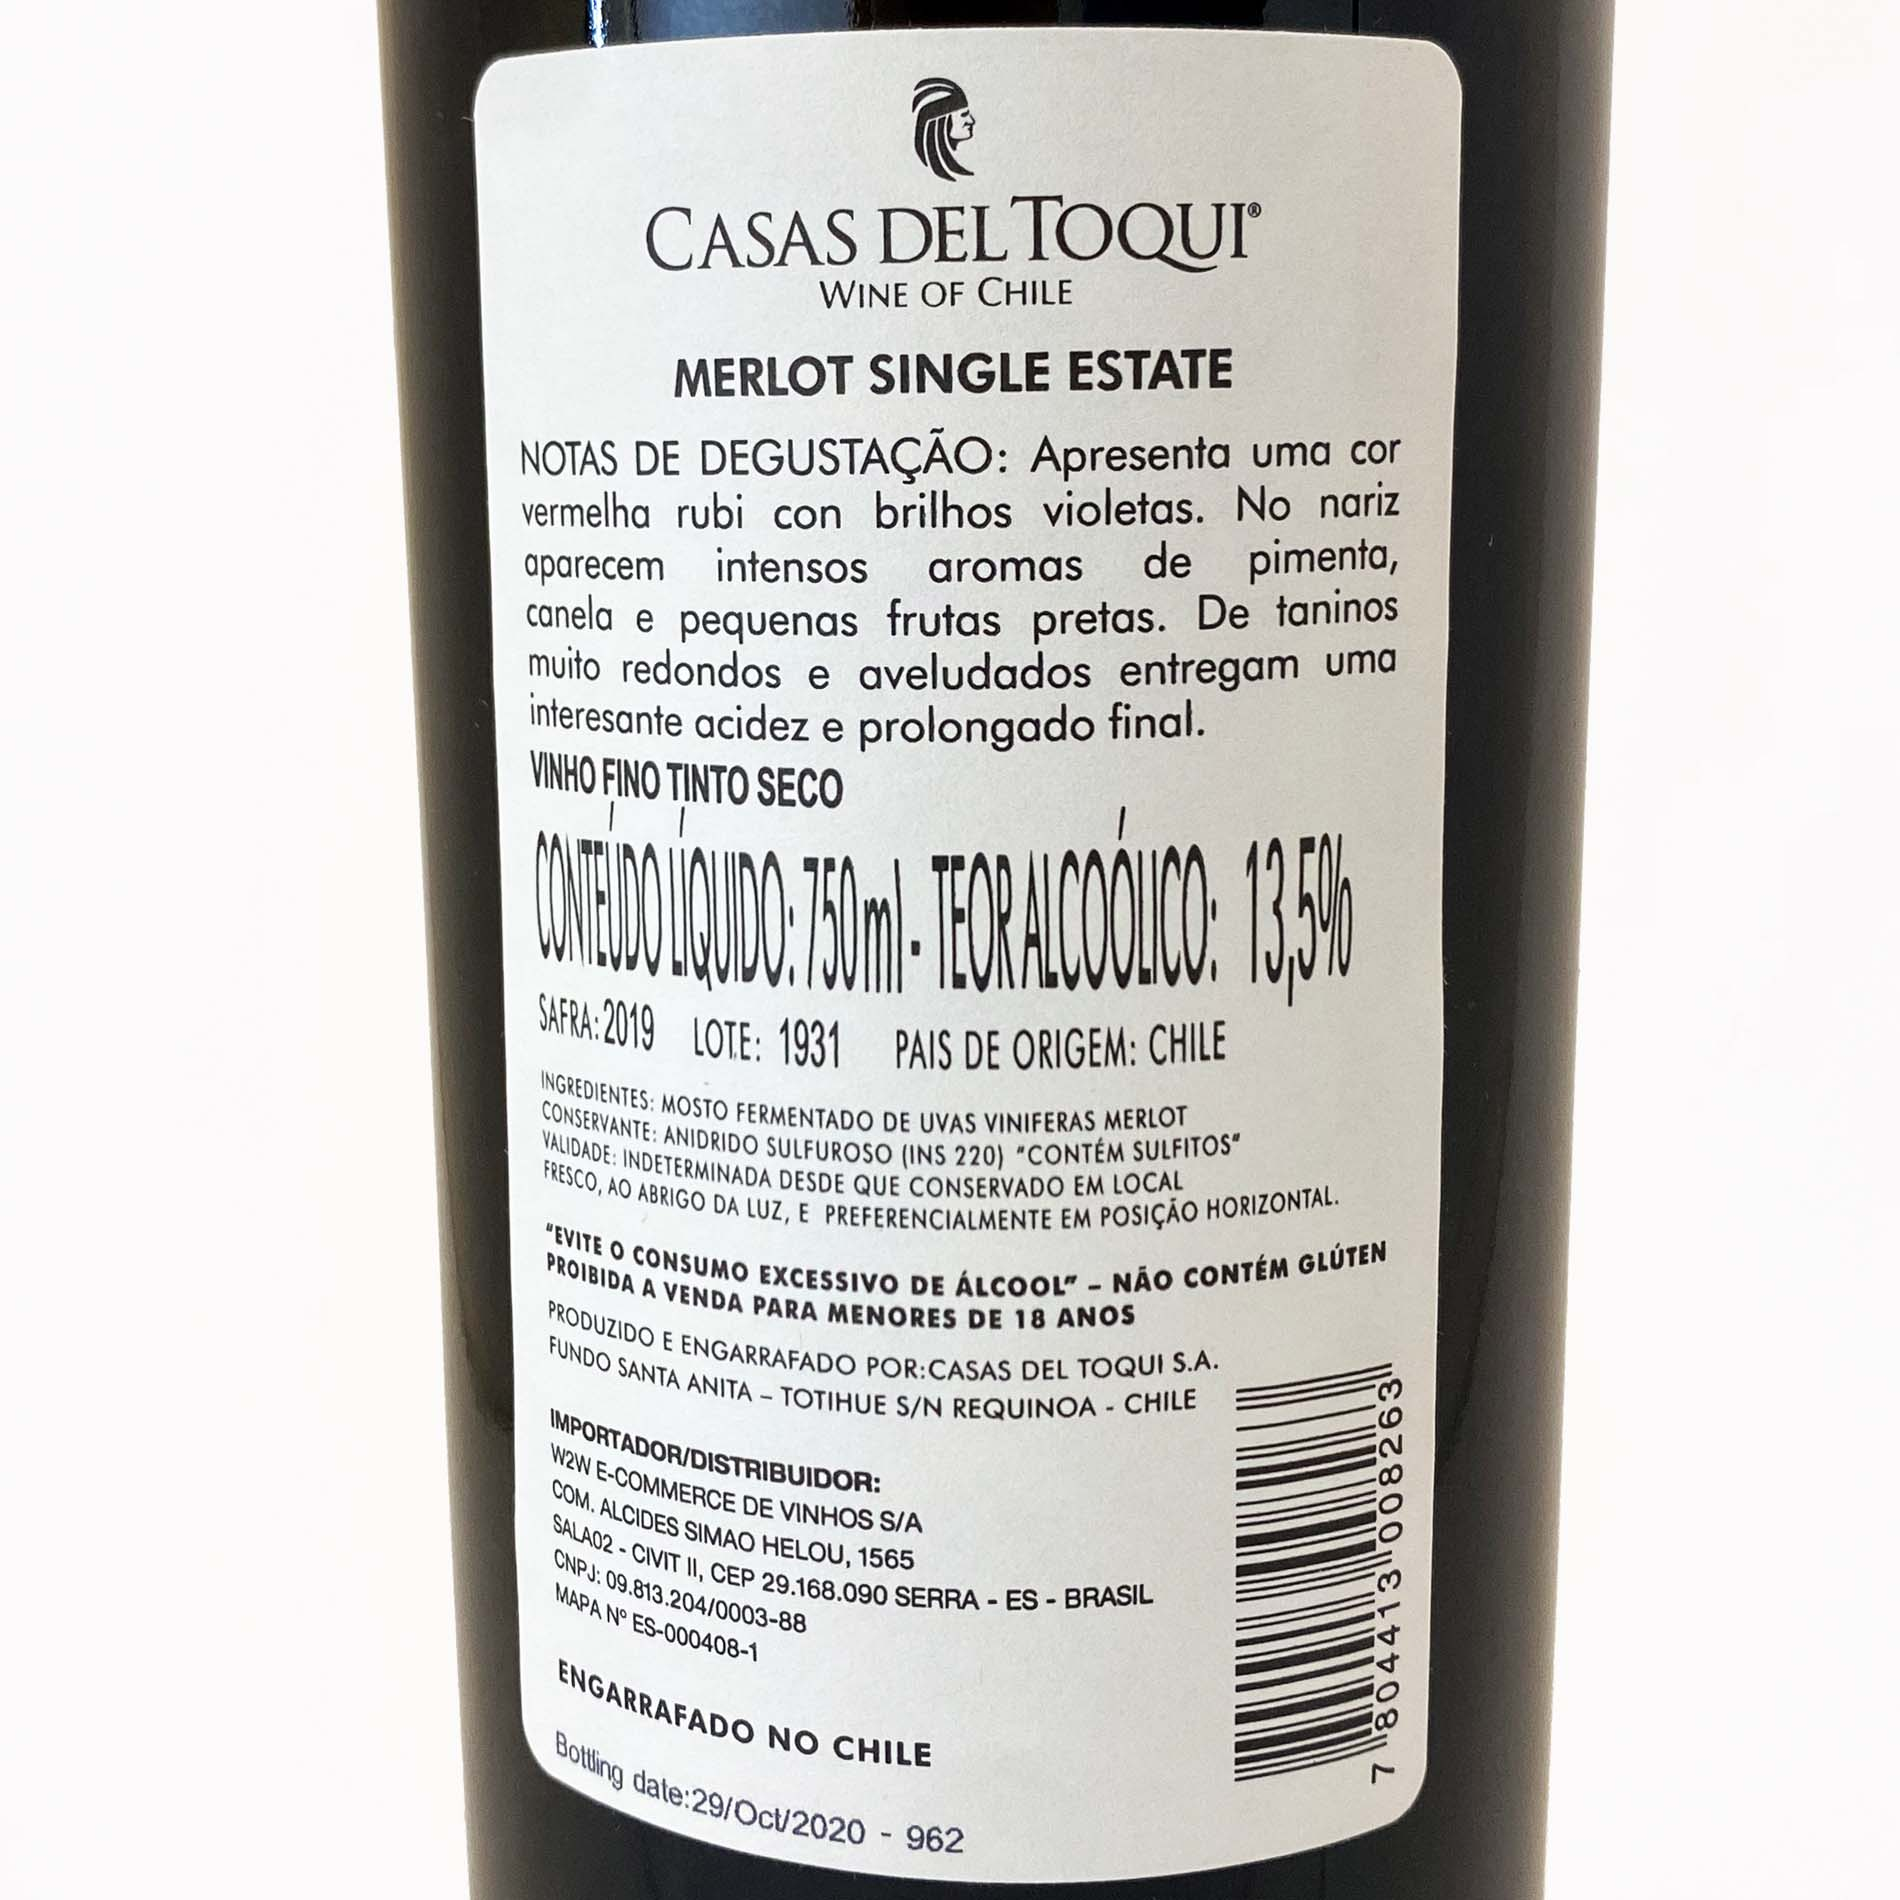 Casas Del Toqui Merlot  - Vinerize